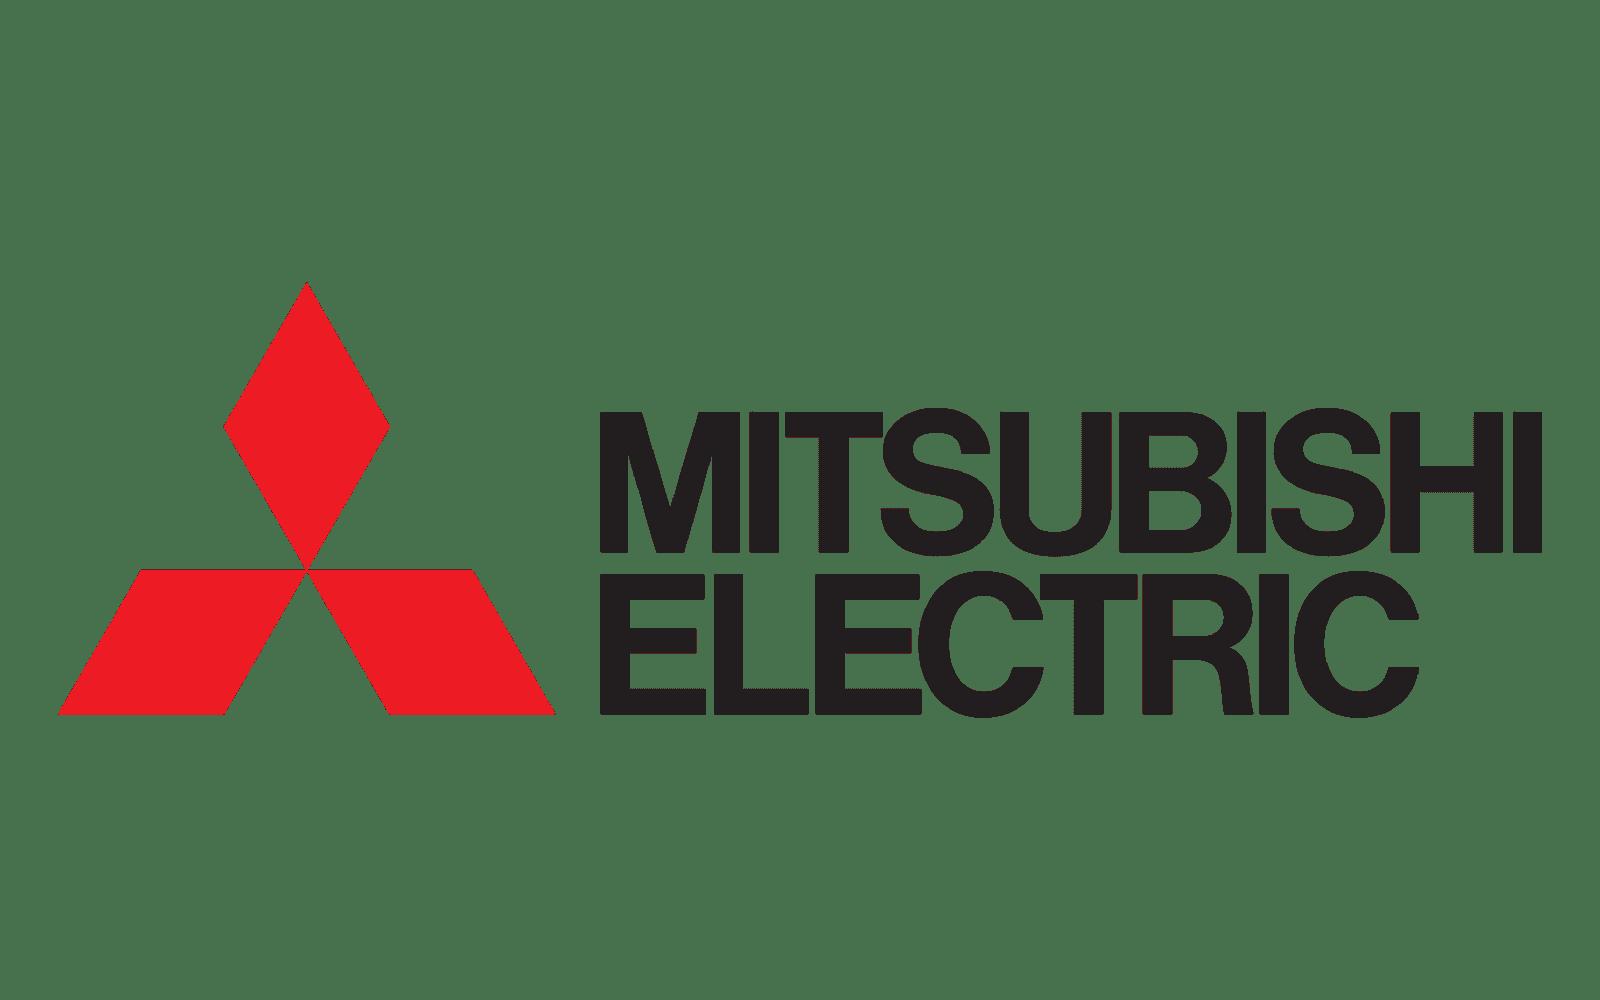 Mitsubishi Electric Mitsubishi Electricity Logos